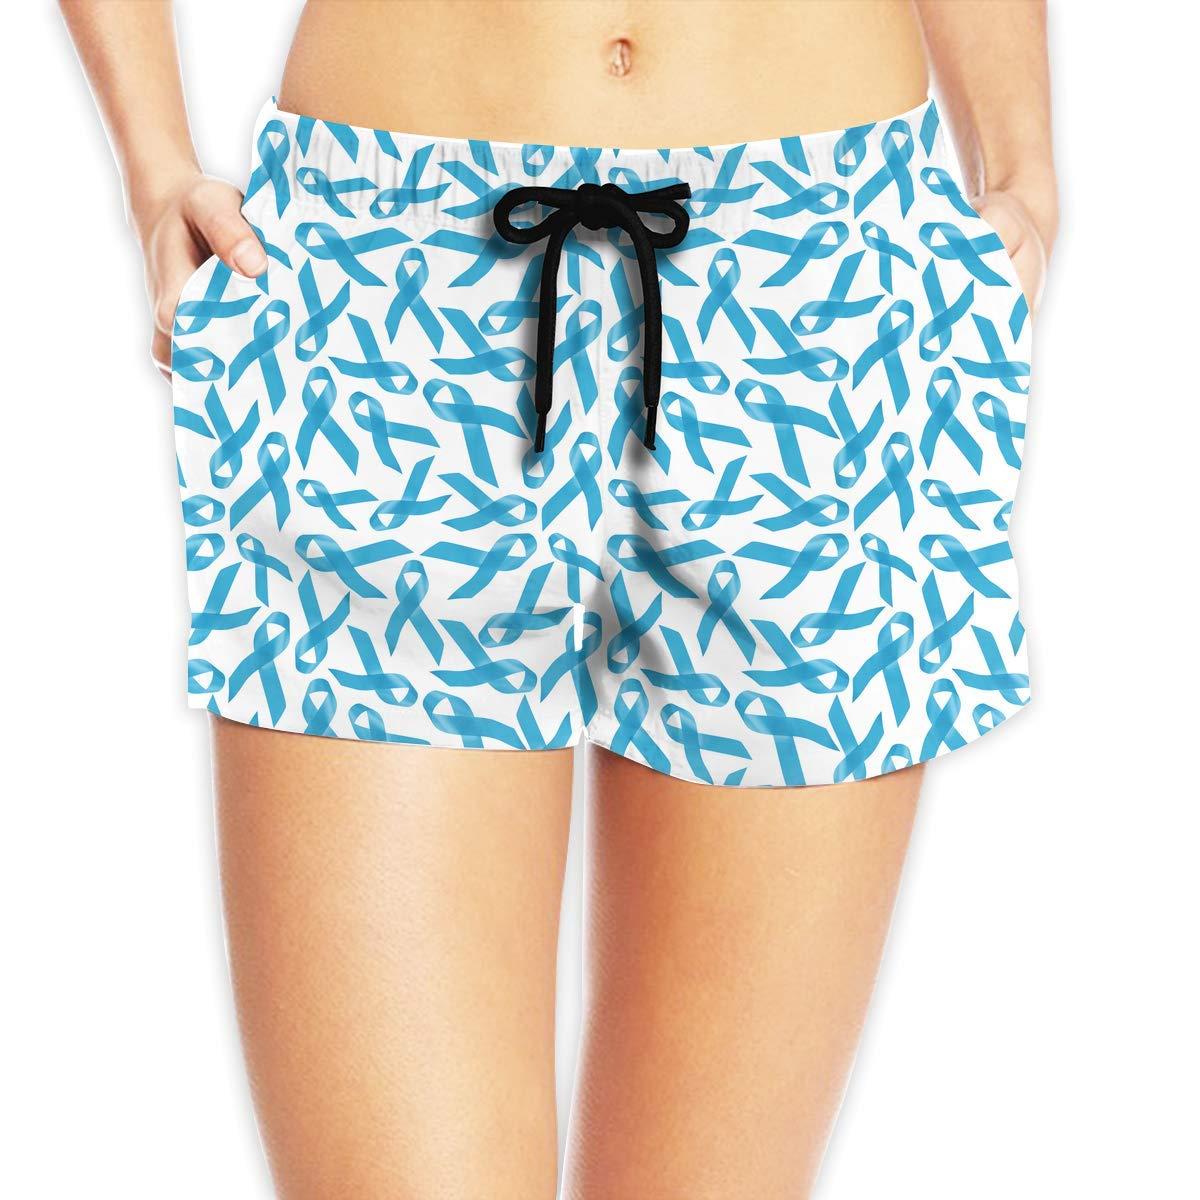 Hlcenng Rainbow Fish Pattern Womens Beach Shorts Dry Fit Beachwear